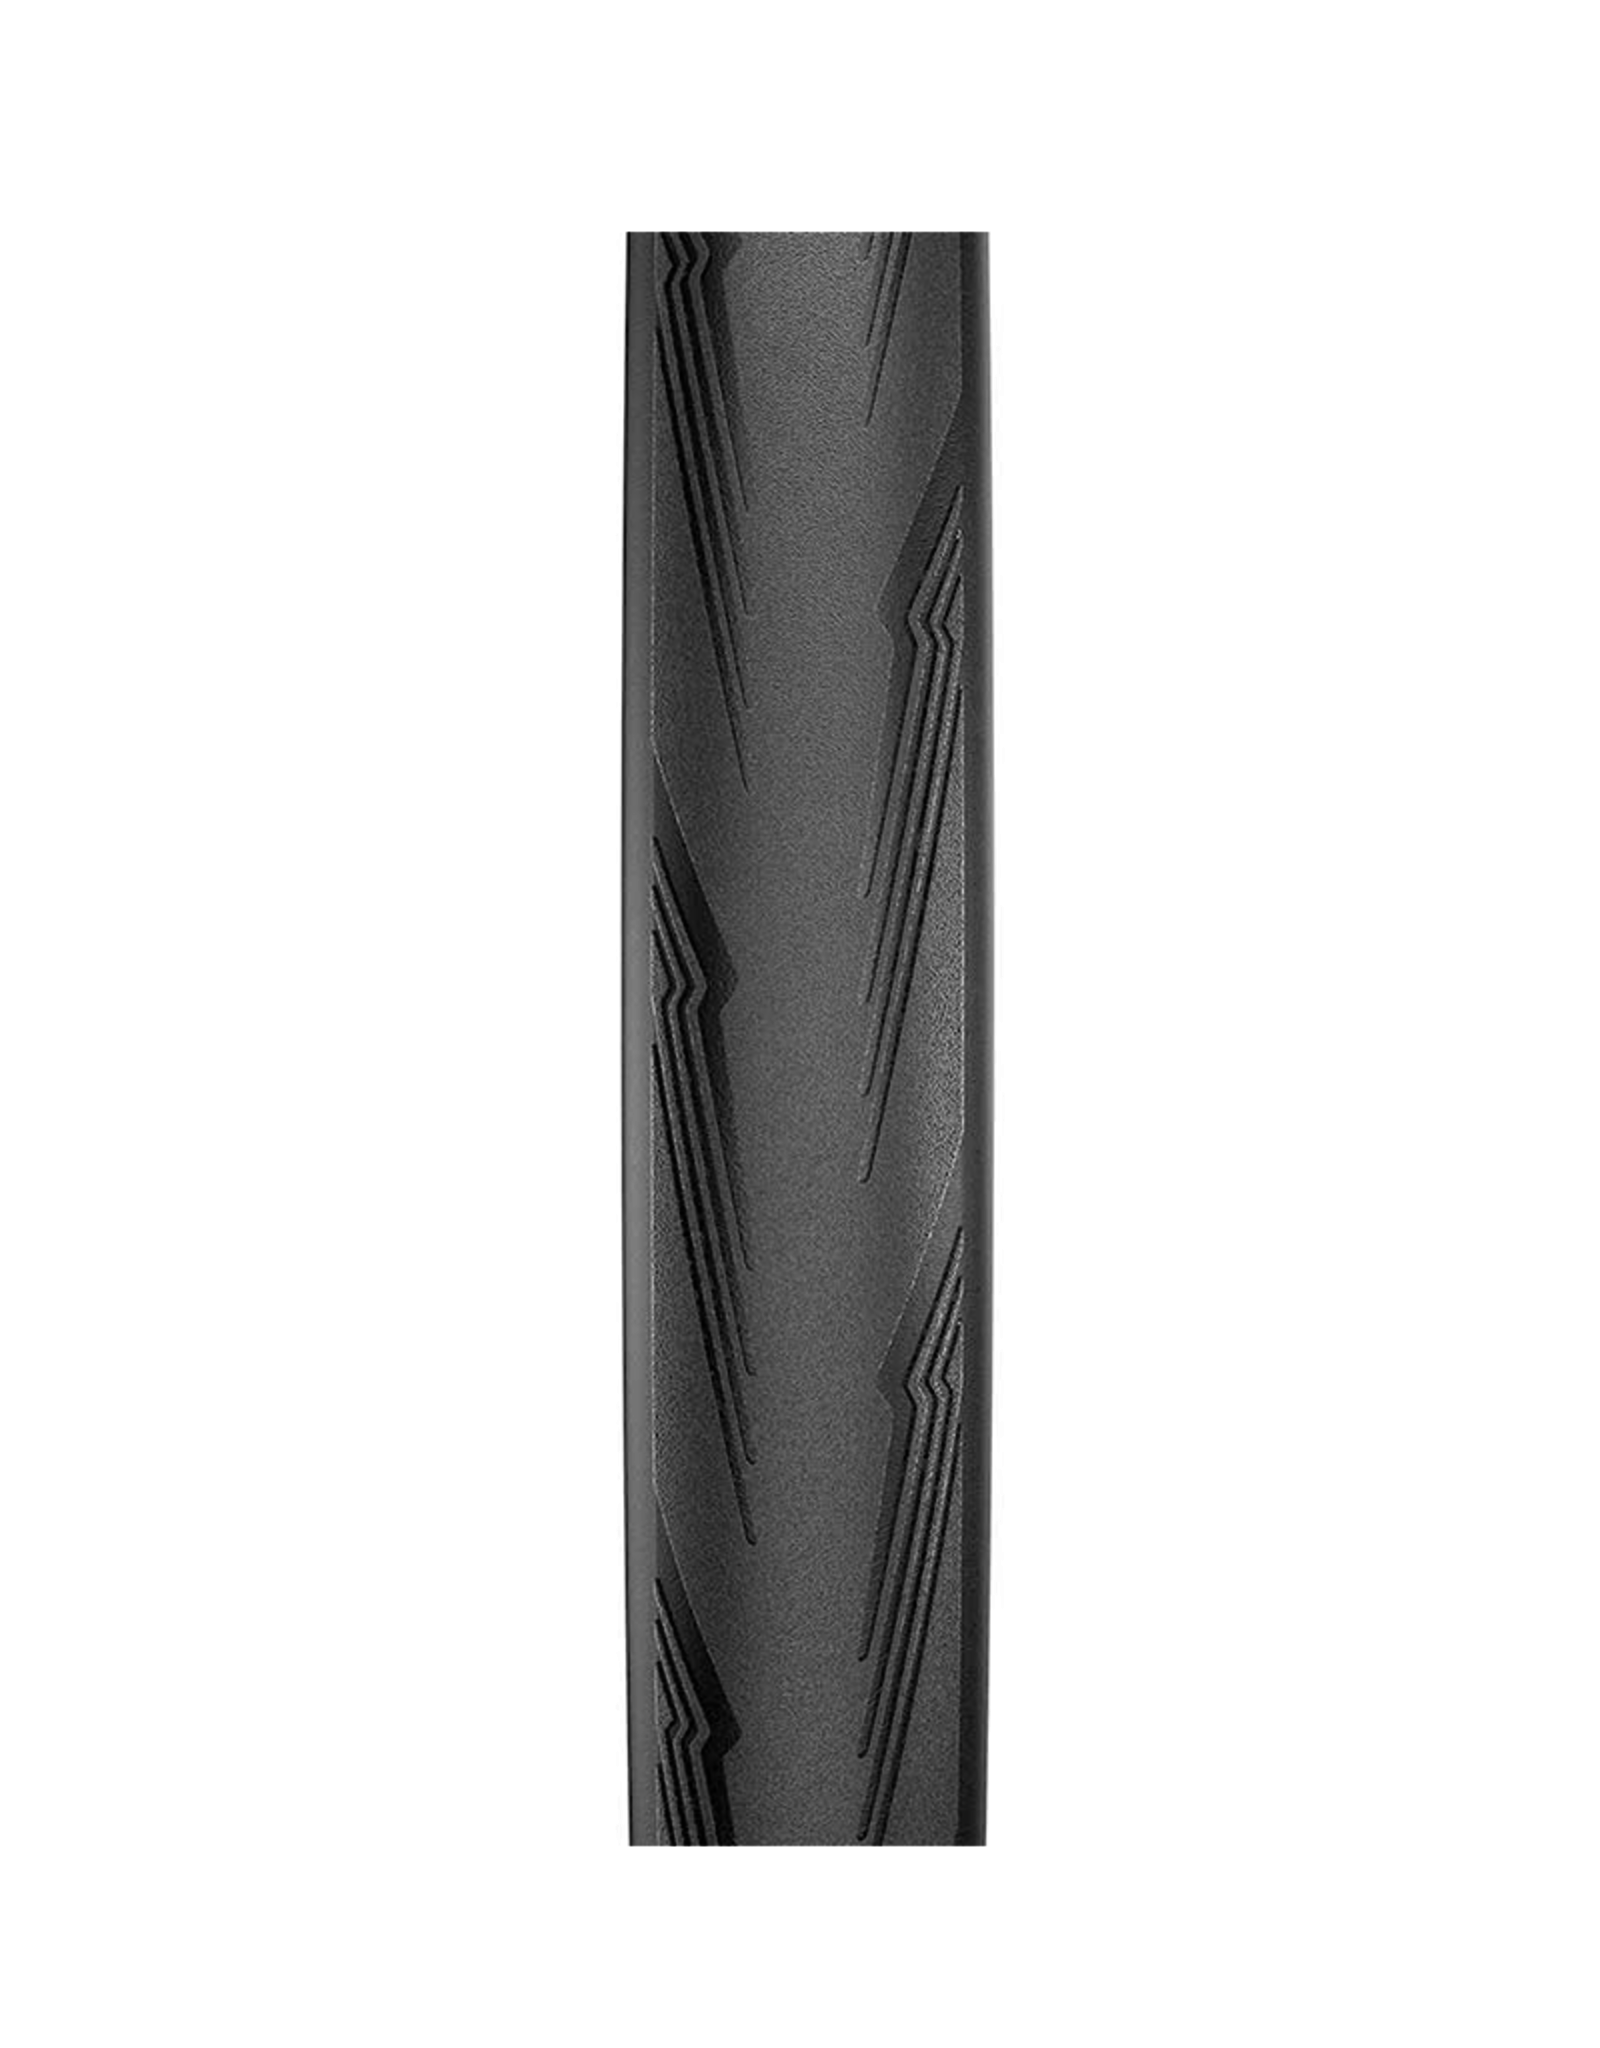 Pirelli Pirelli, PZero Velo 4S, 700x28C, Pliable, Smartnet Silica, Aramid Fiber, 127TPI, 250g, Noir